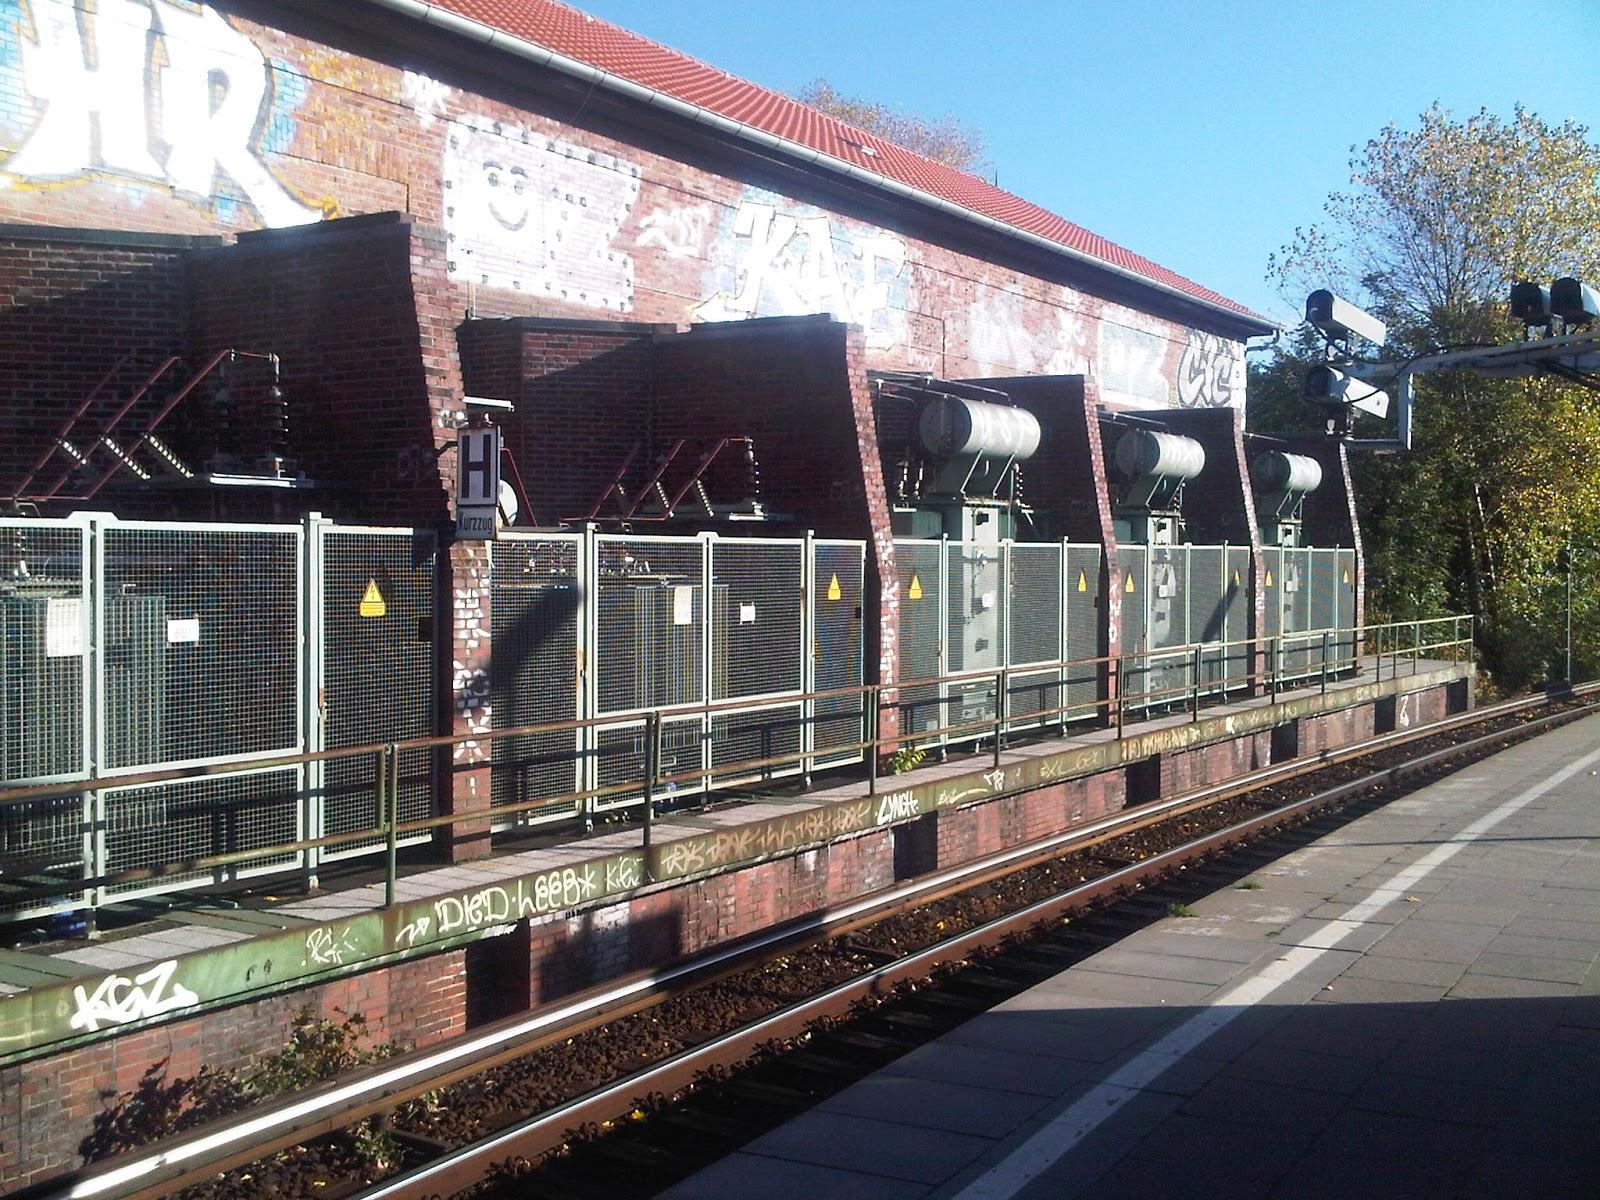 Umspannwerk - S-Bahn-Station Berliner Tor